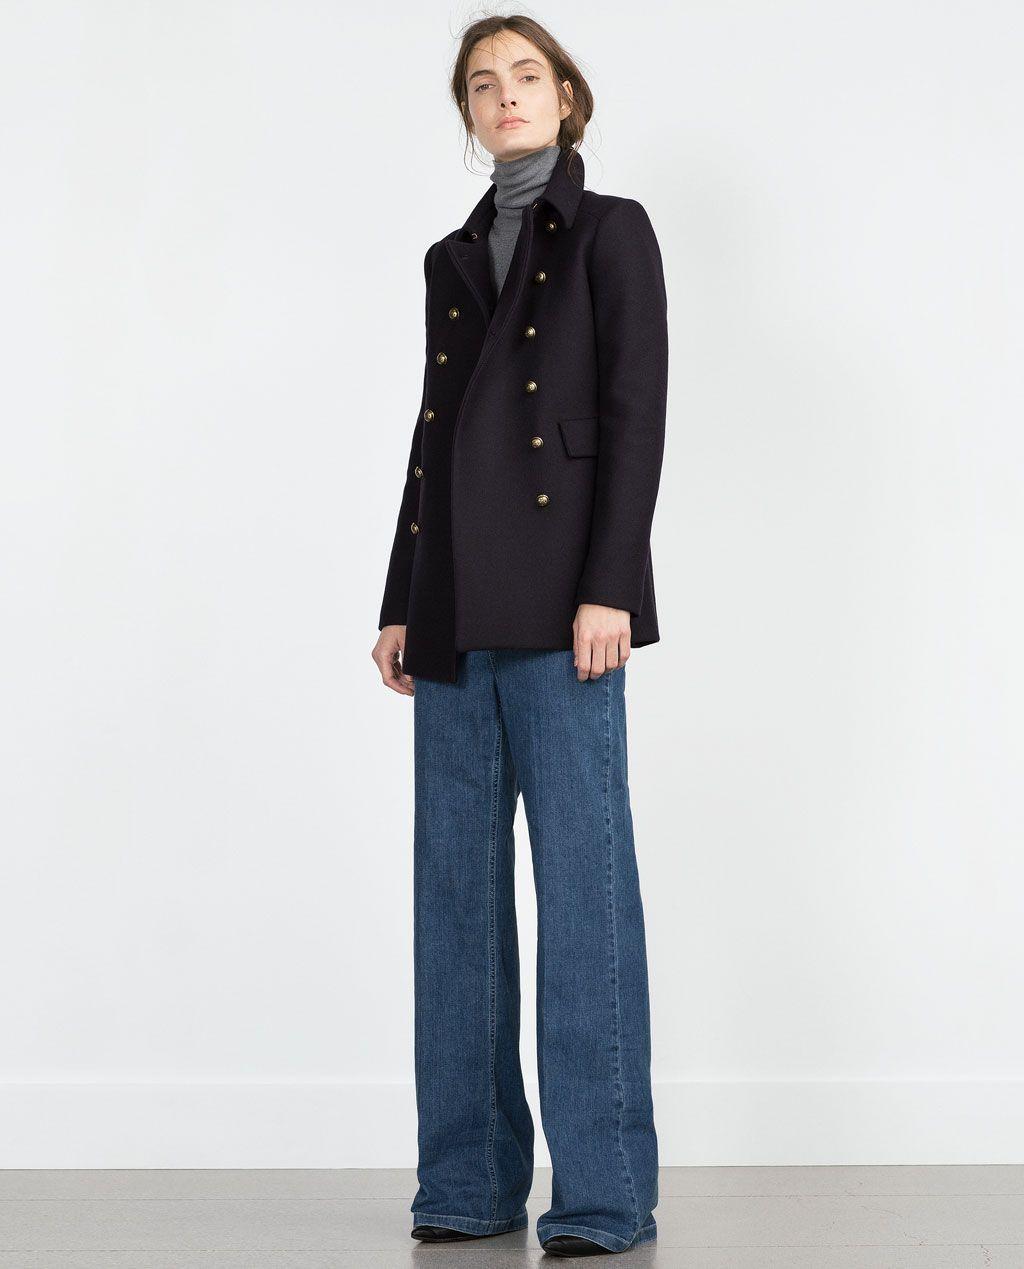 Zara abrigos mujer azul marino